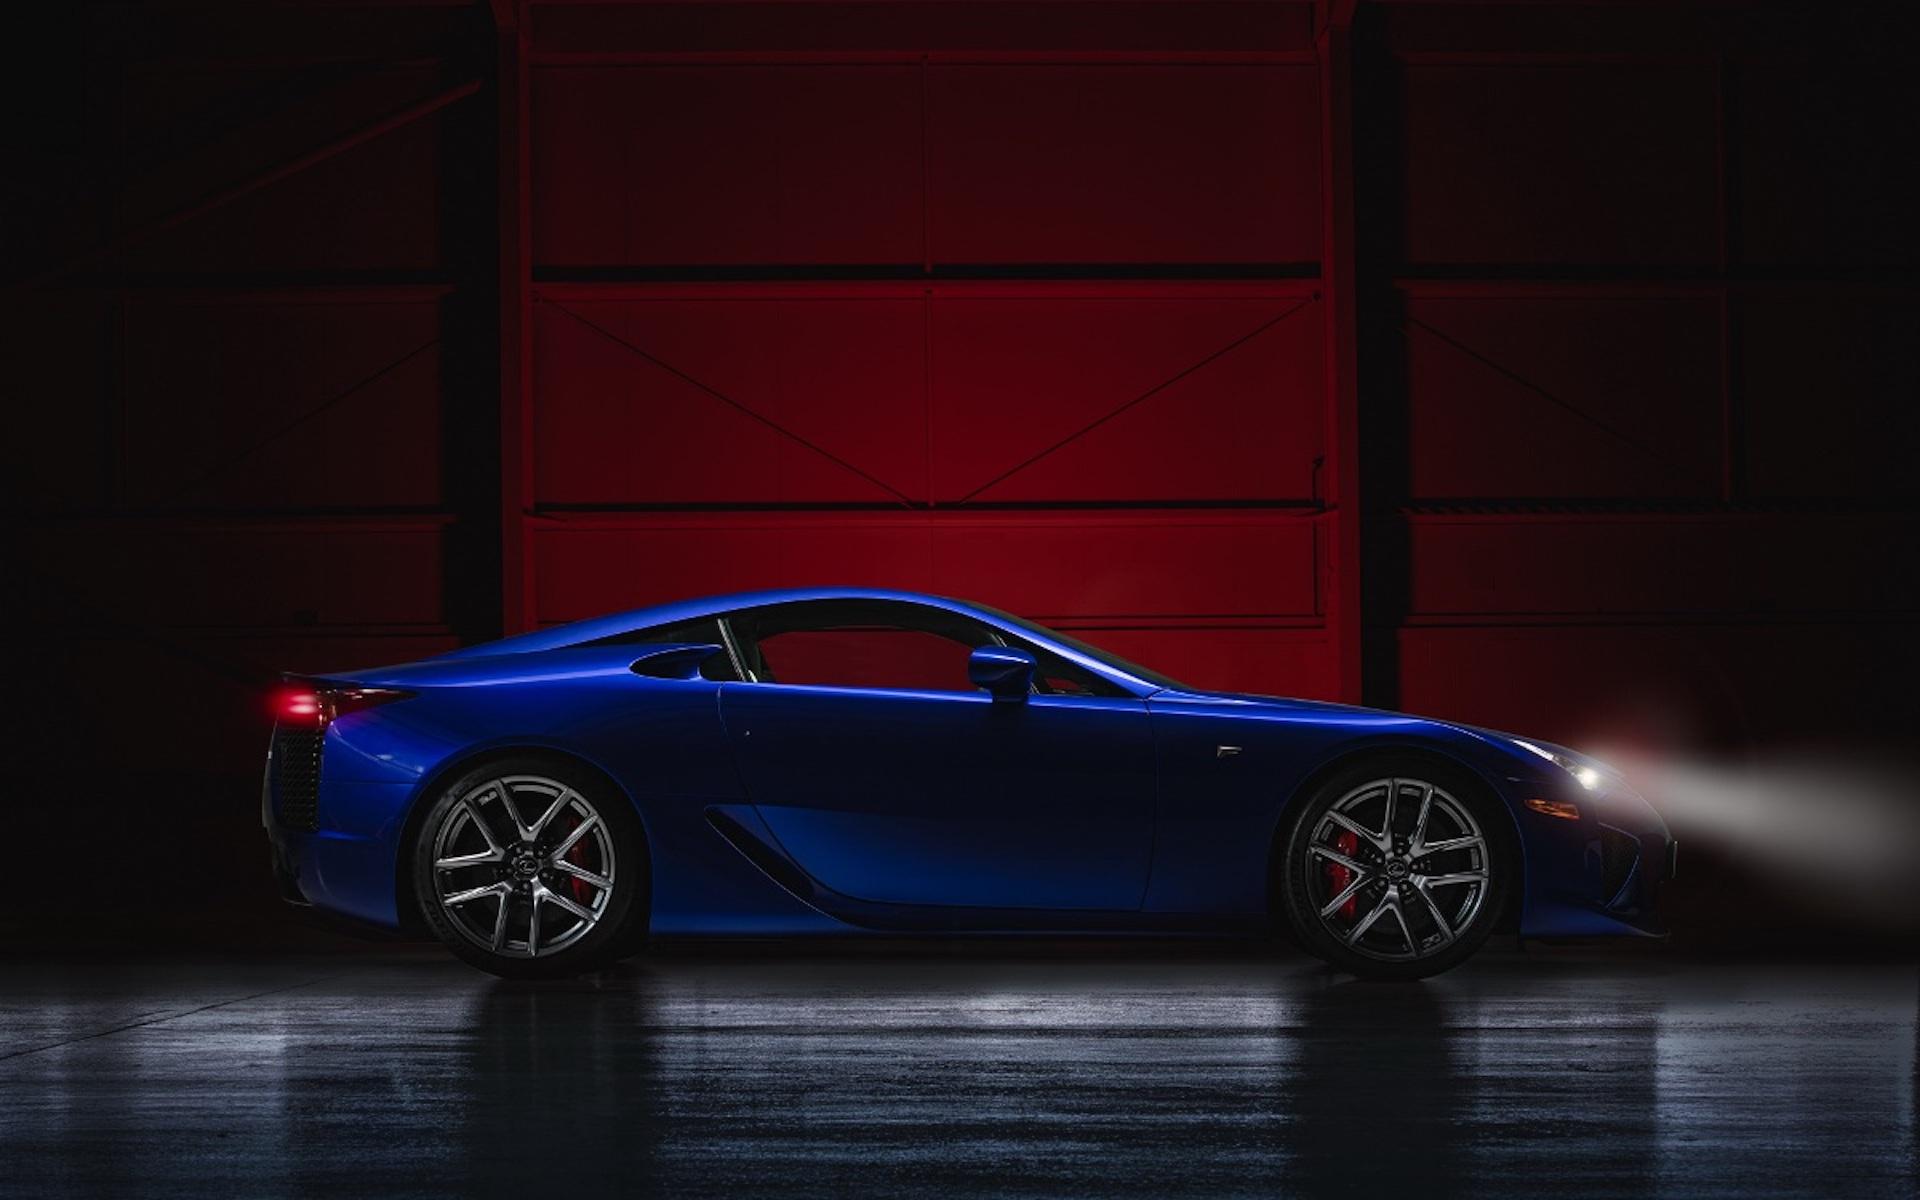 Lexus Lfa 10 Aniversario 2